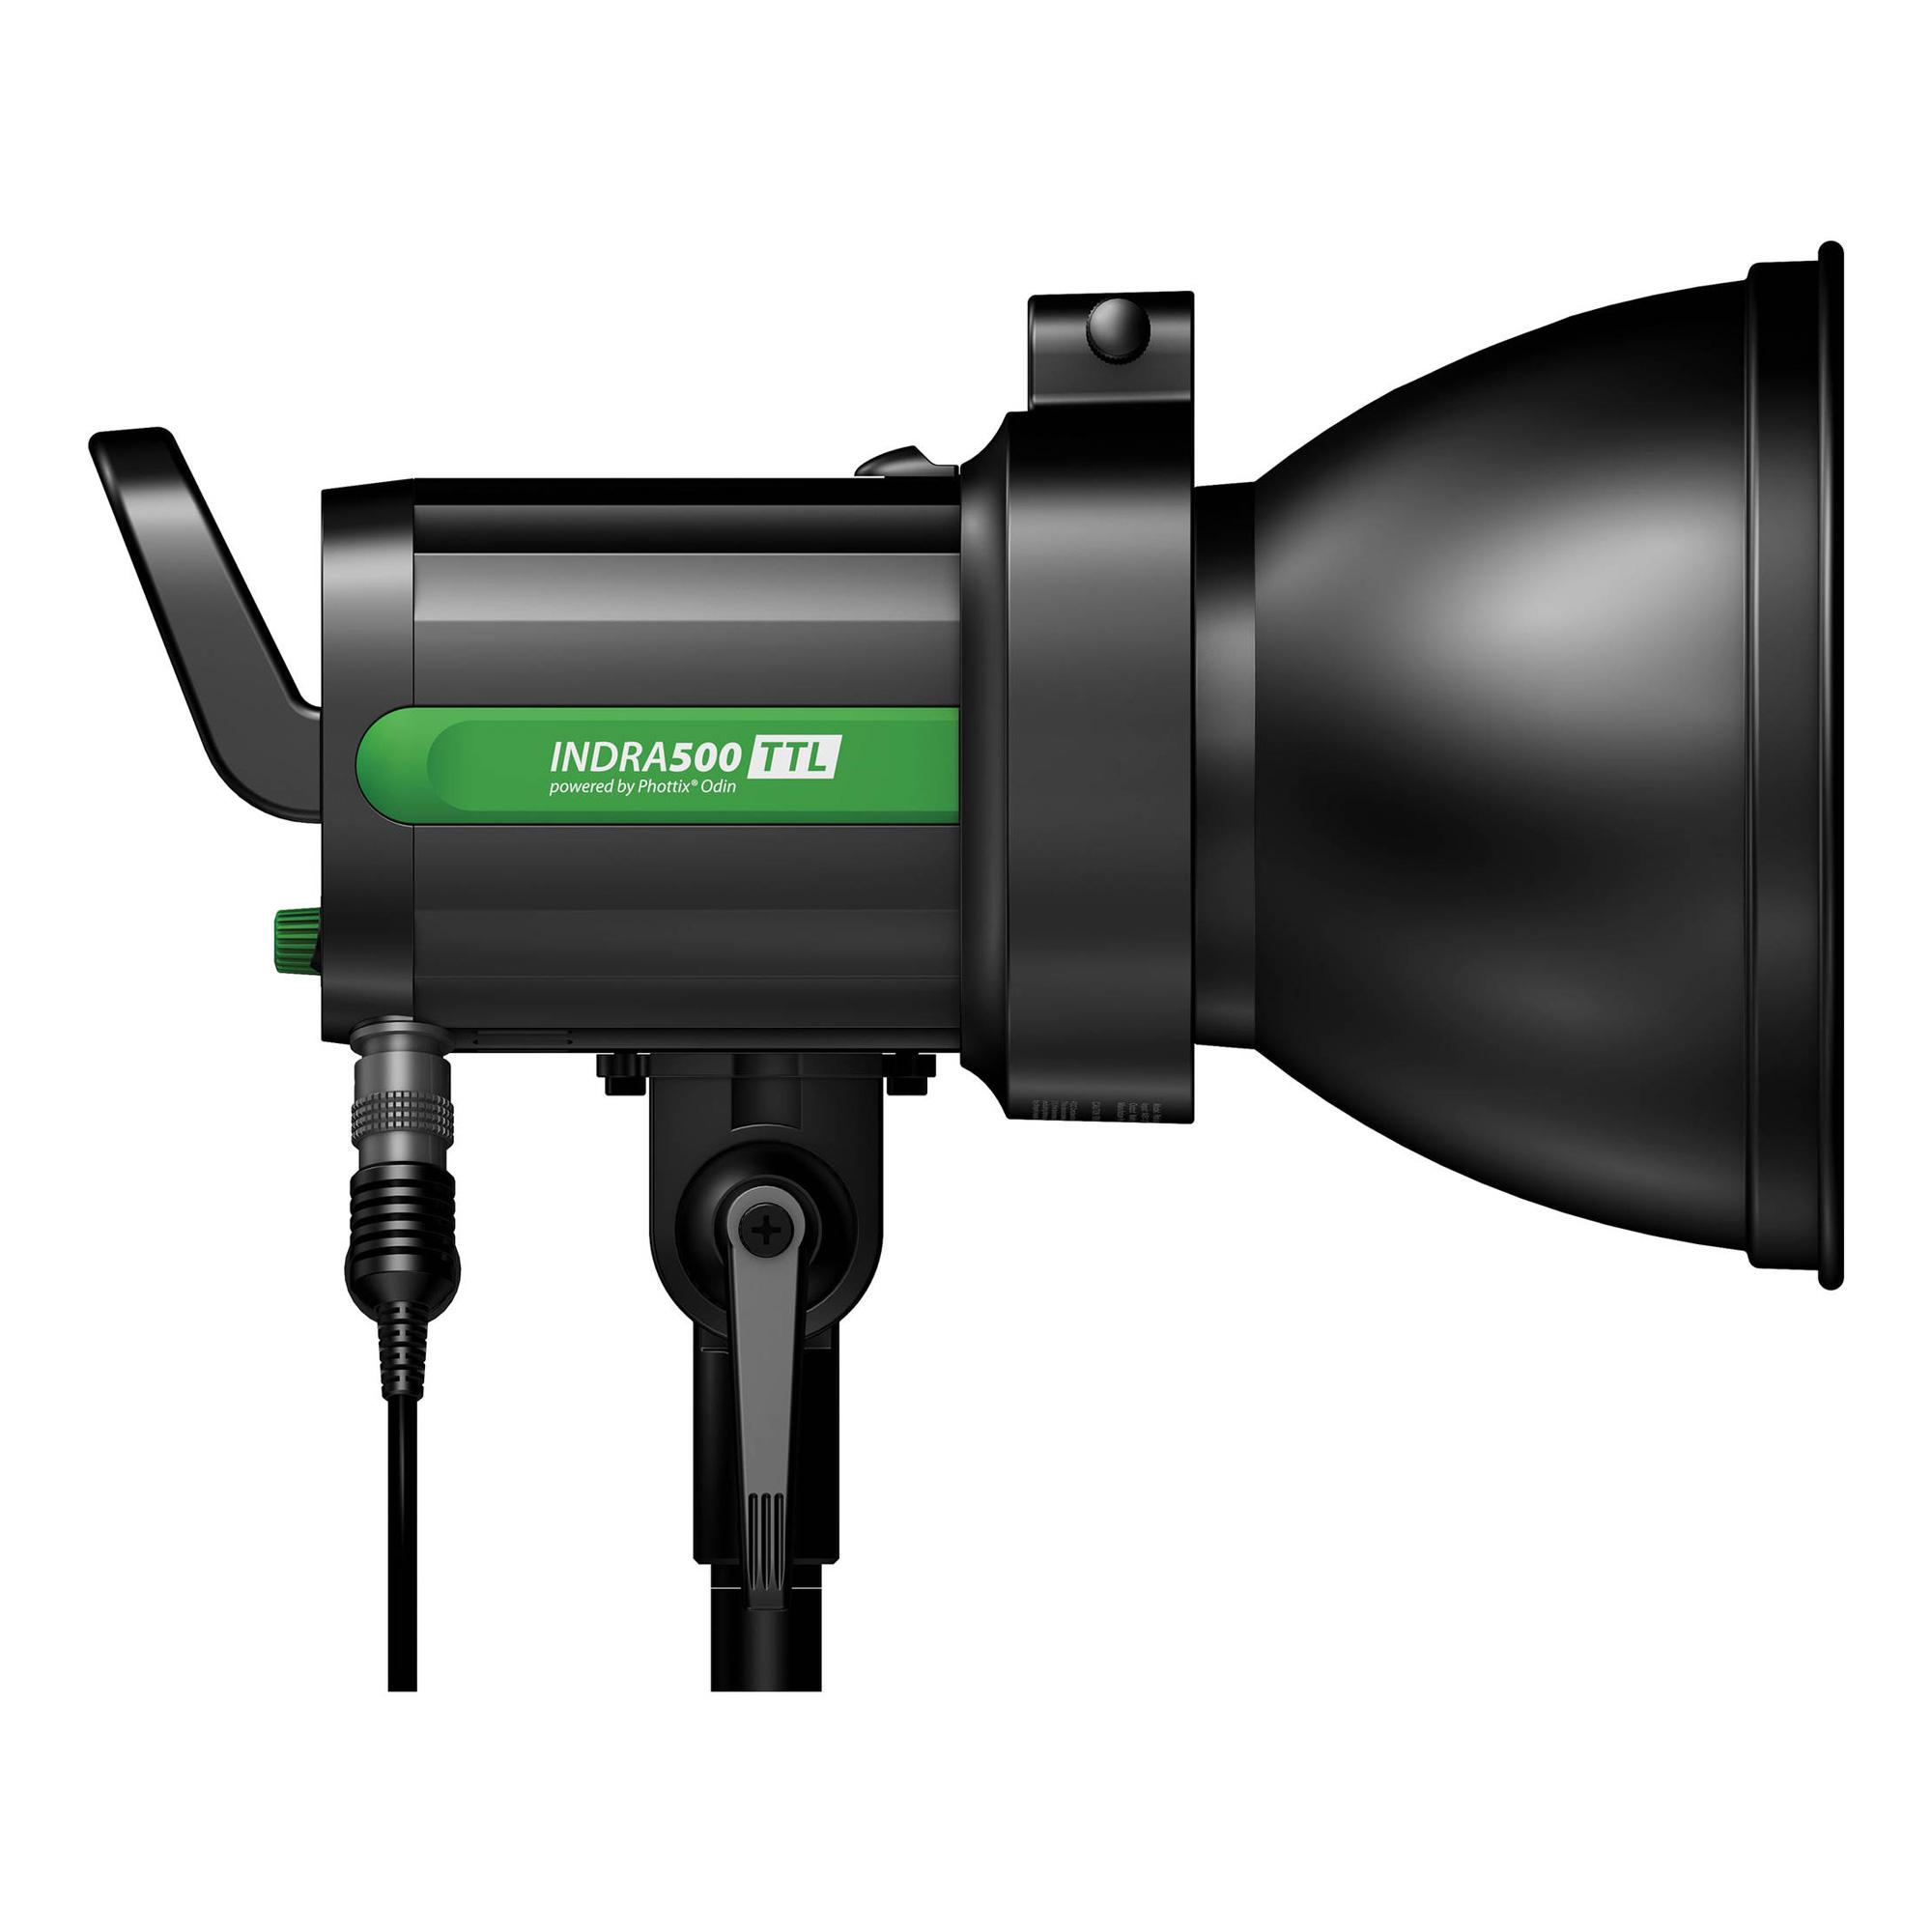 Indra500 TTL Battery Powered Studio Light